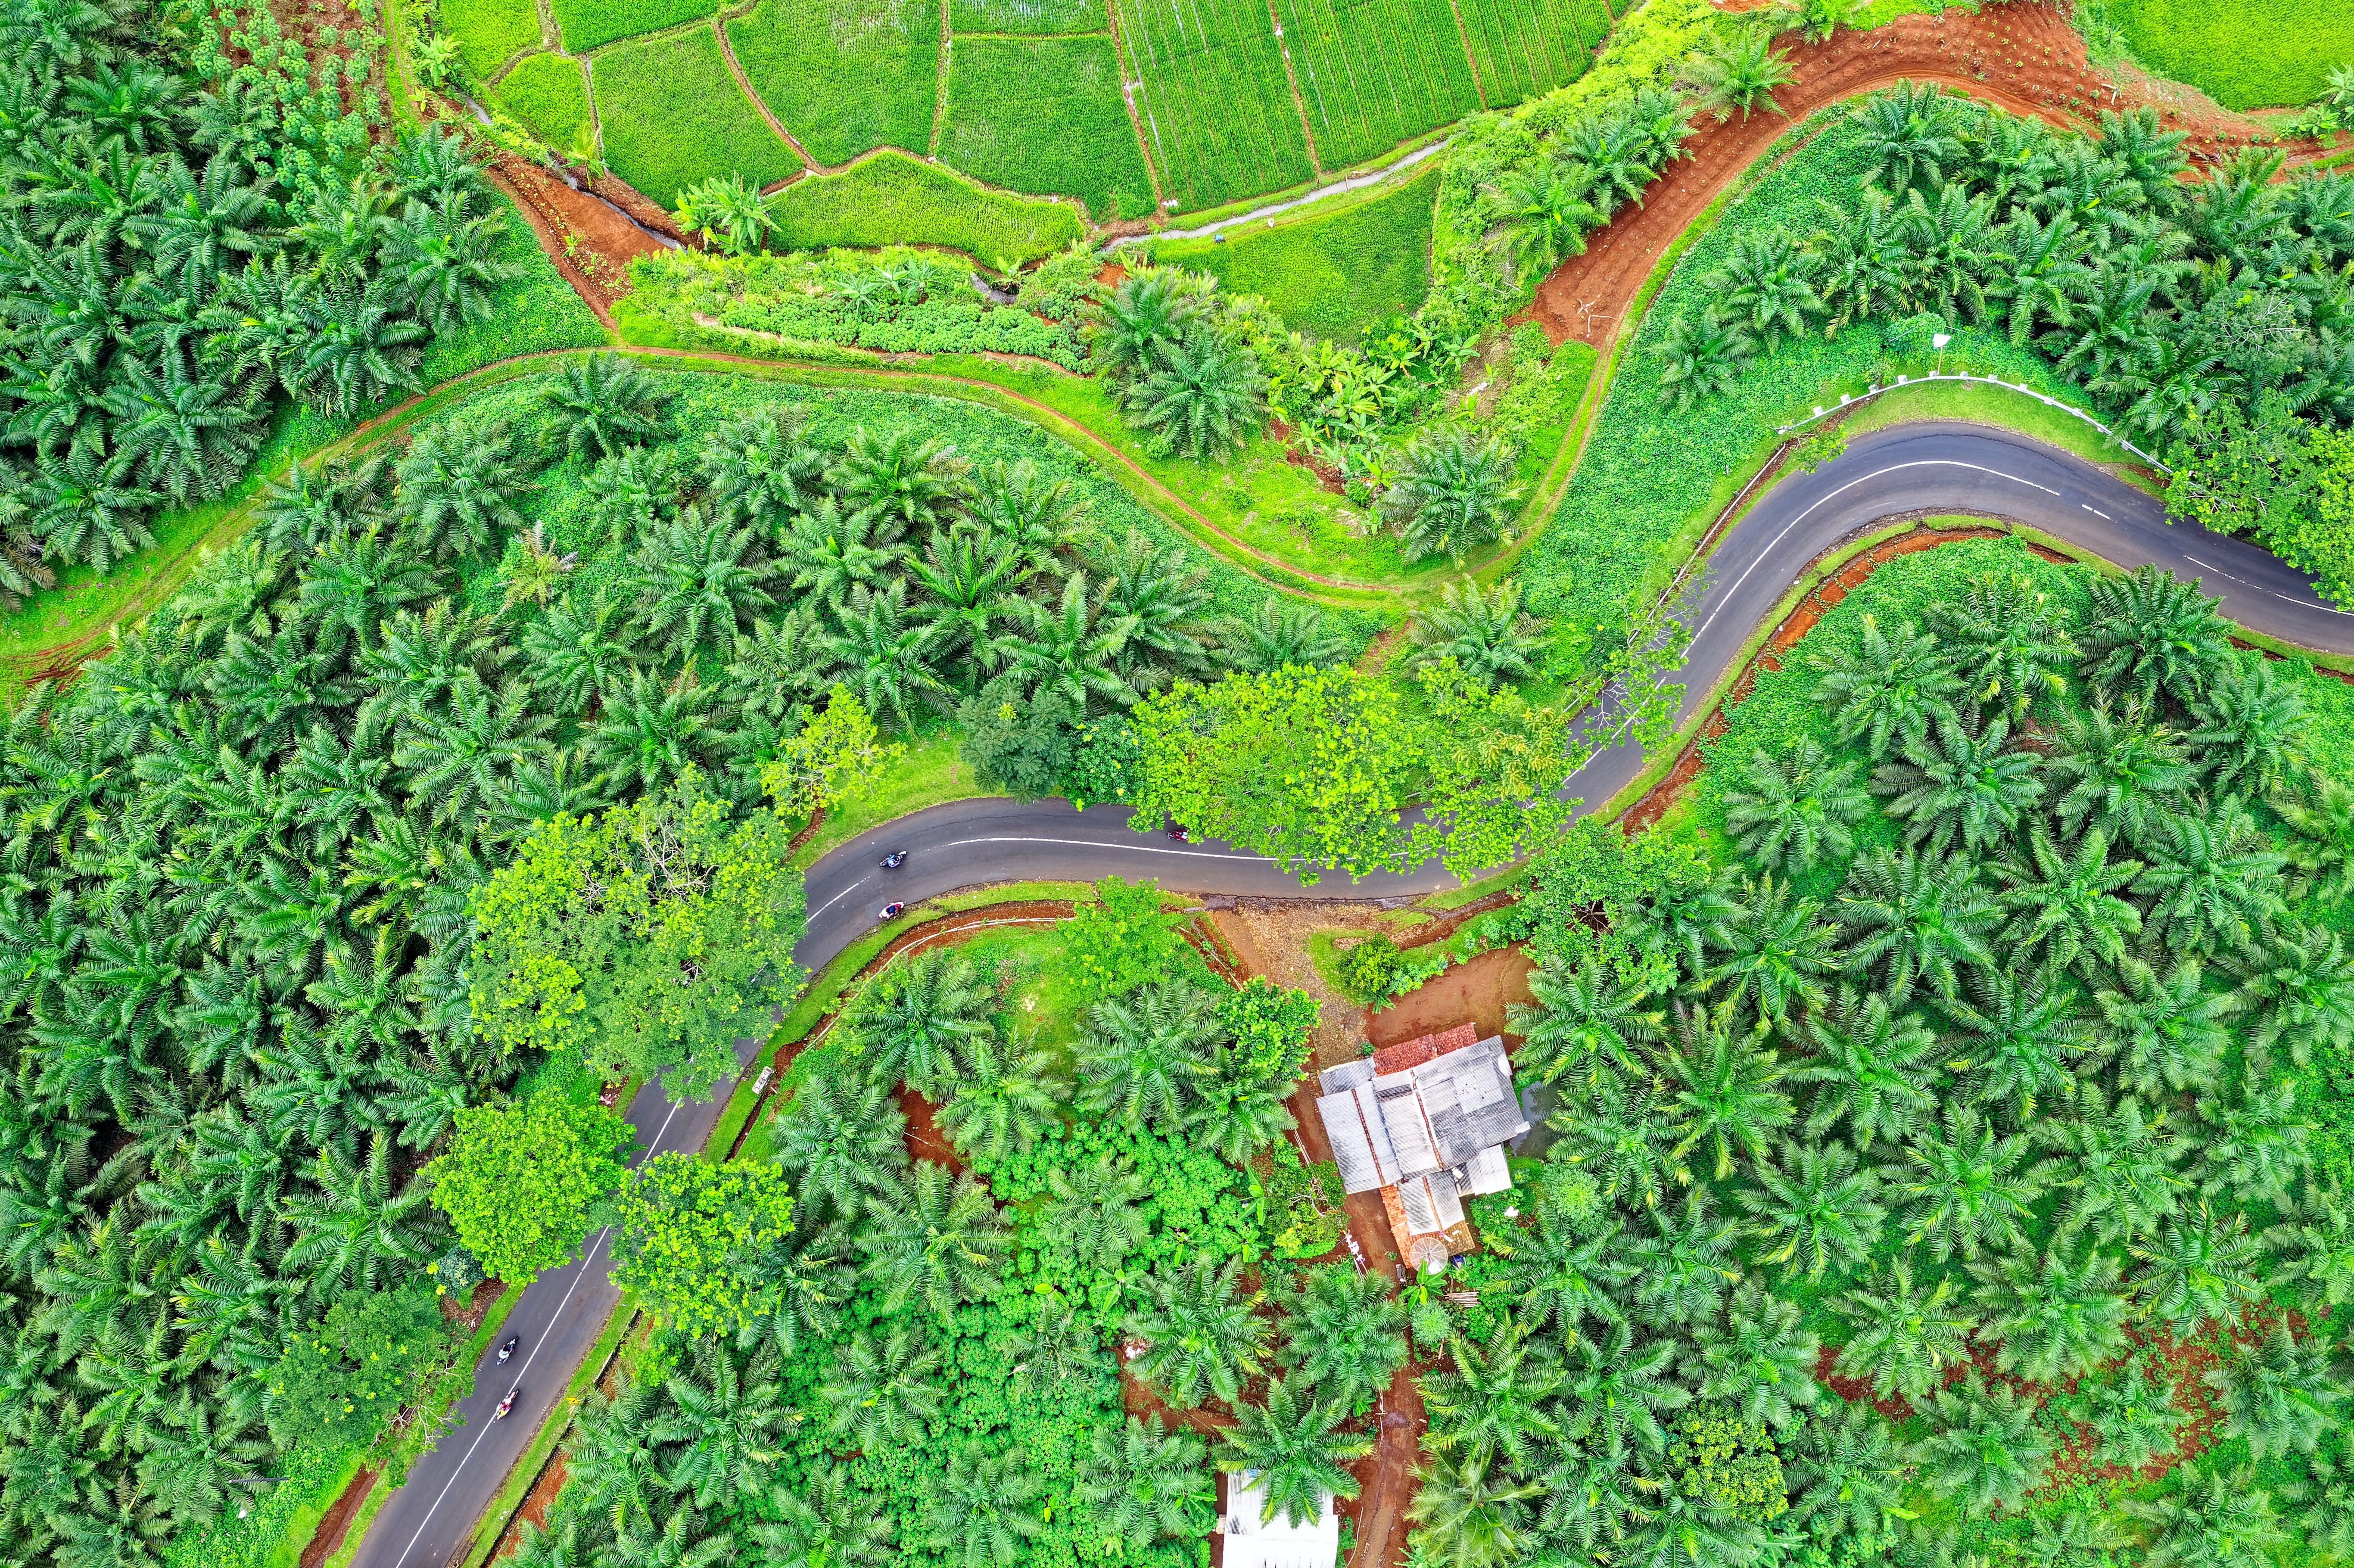 Aerial Shot Of Rural Area